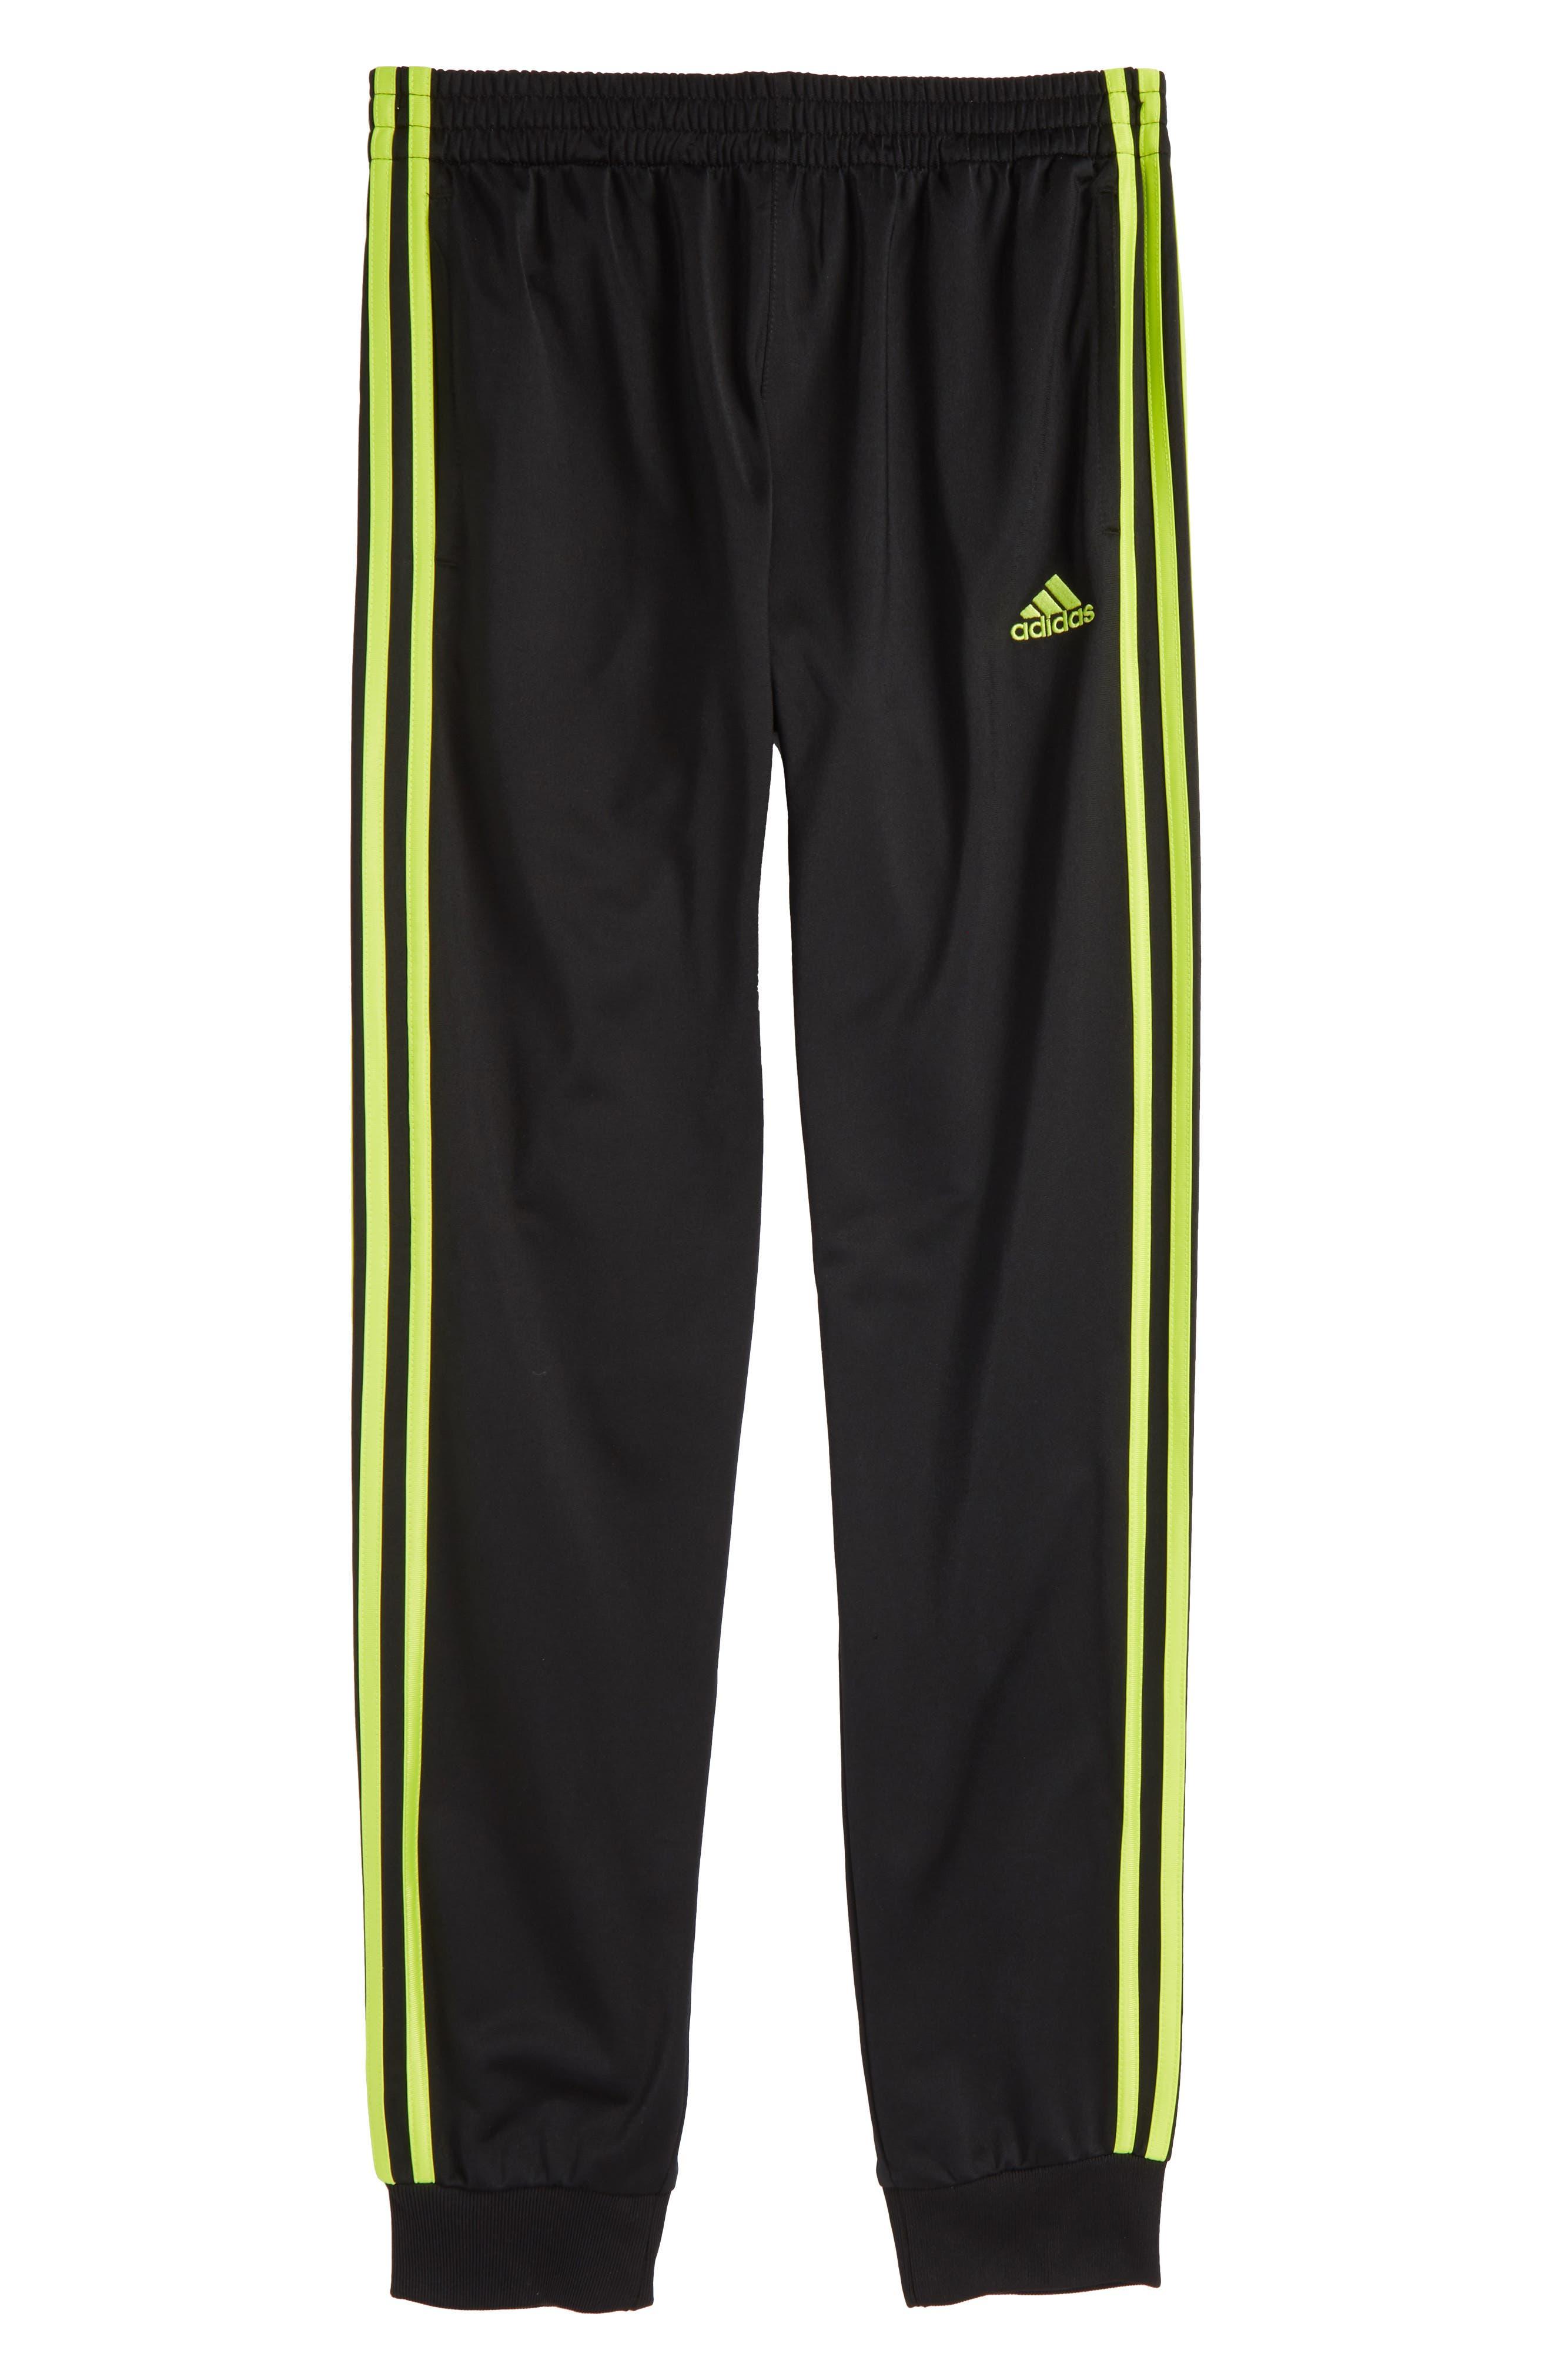 Iconic Jogger Pants,                             Alternate thumbnail 4, color,                             Black/ Yellow